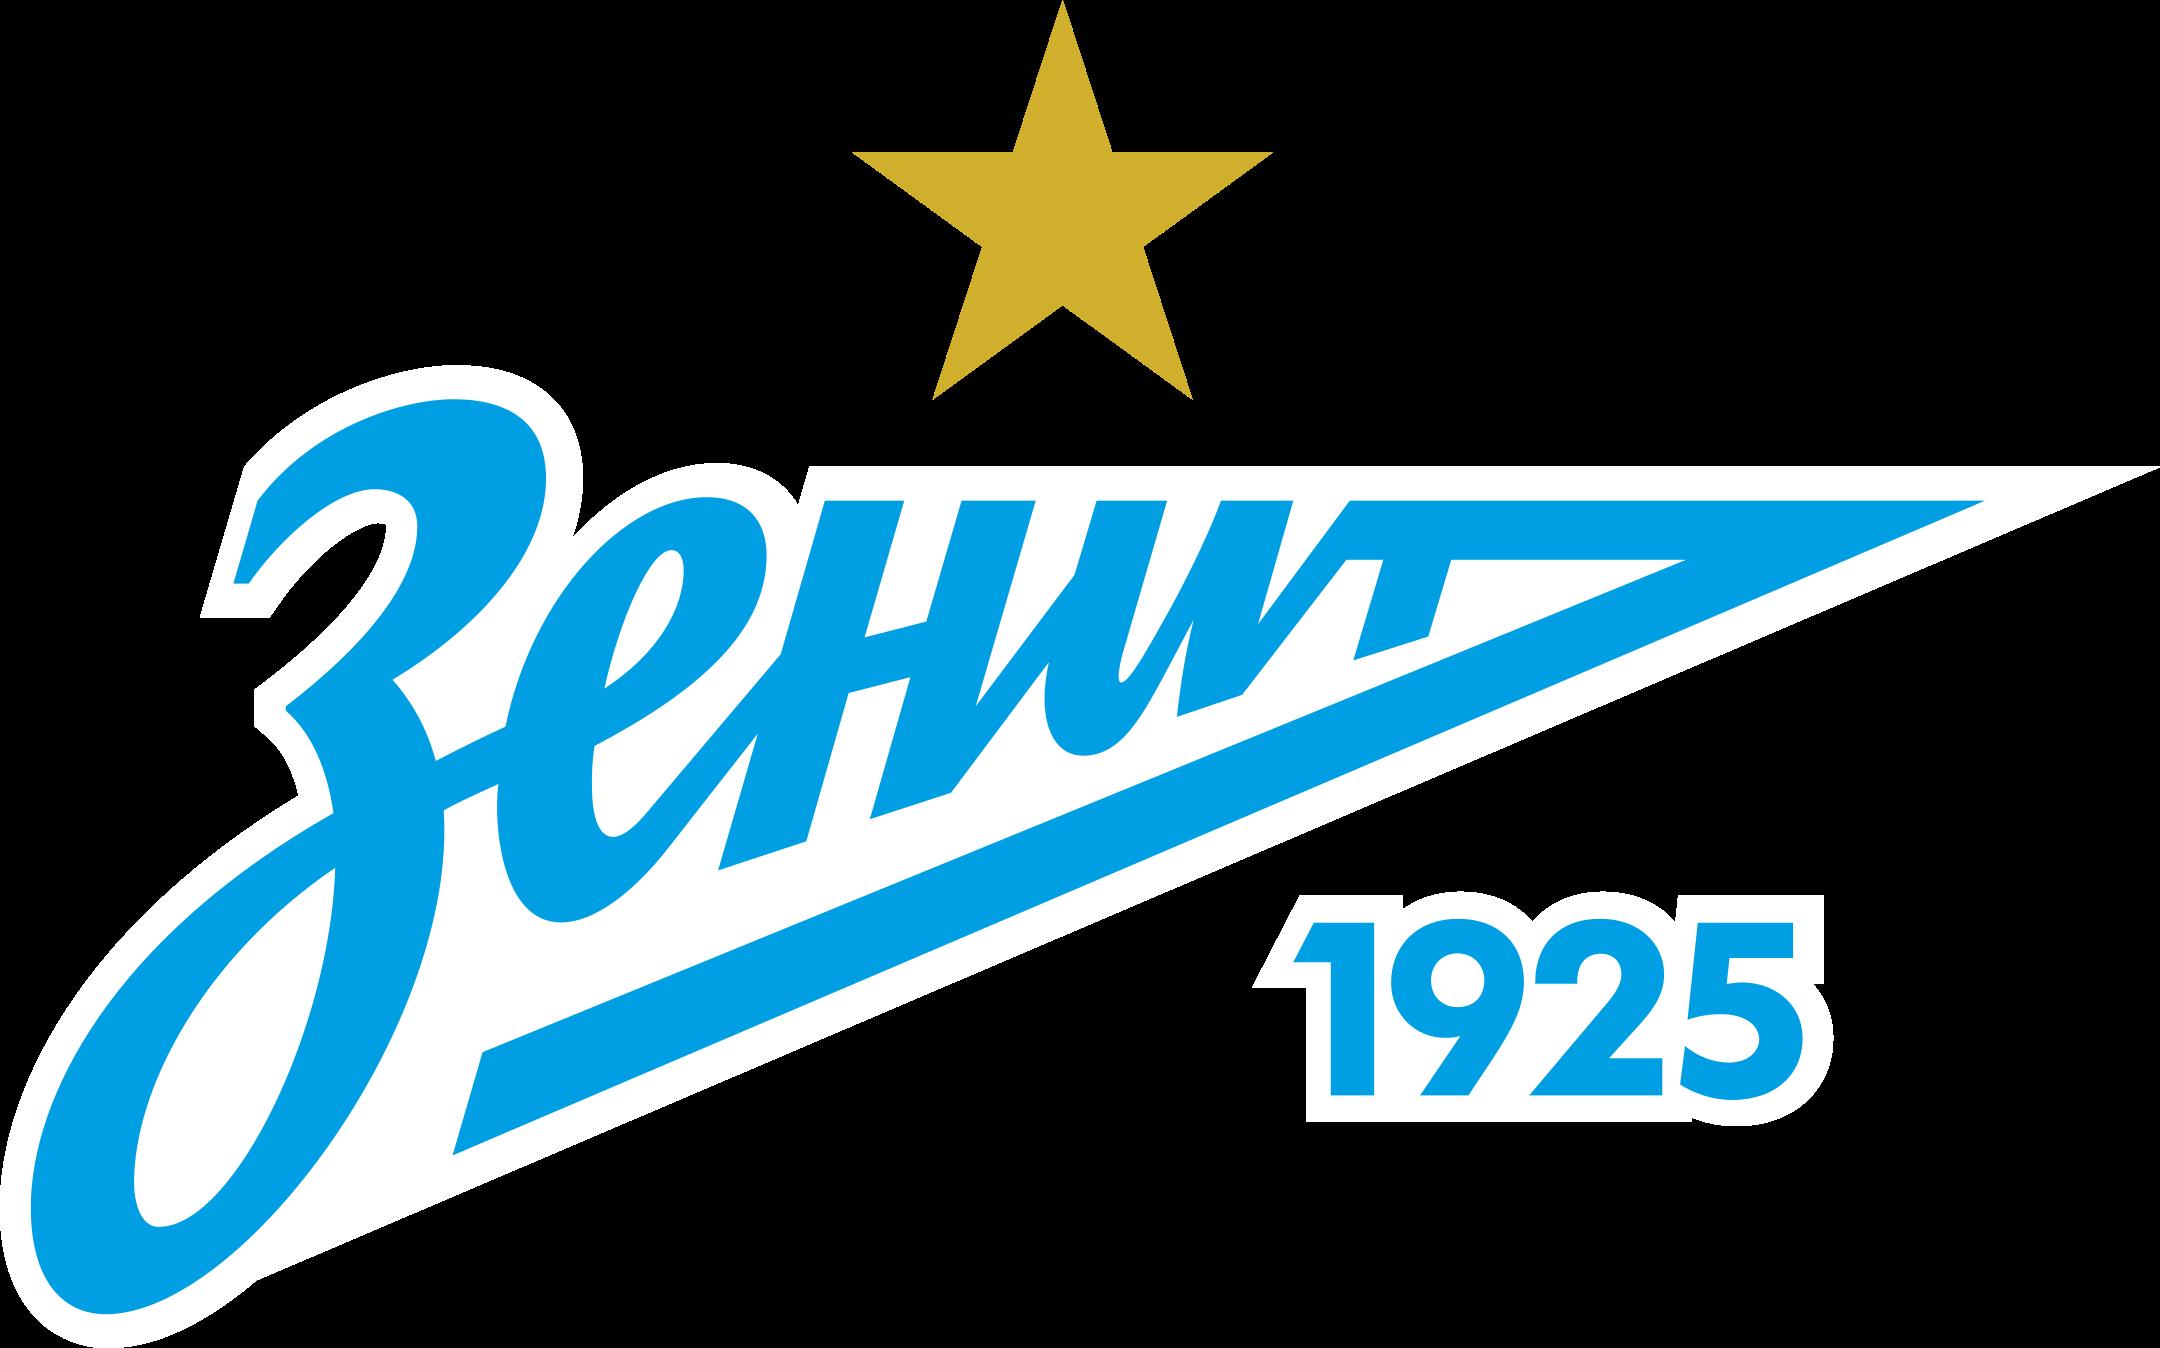 fc zenit logo 1 - FC Zenit Logo - Escudo